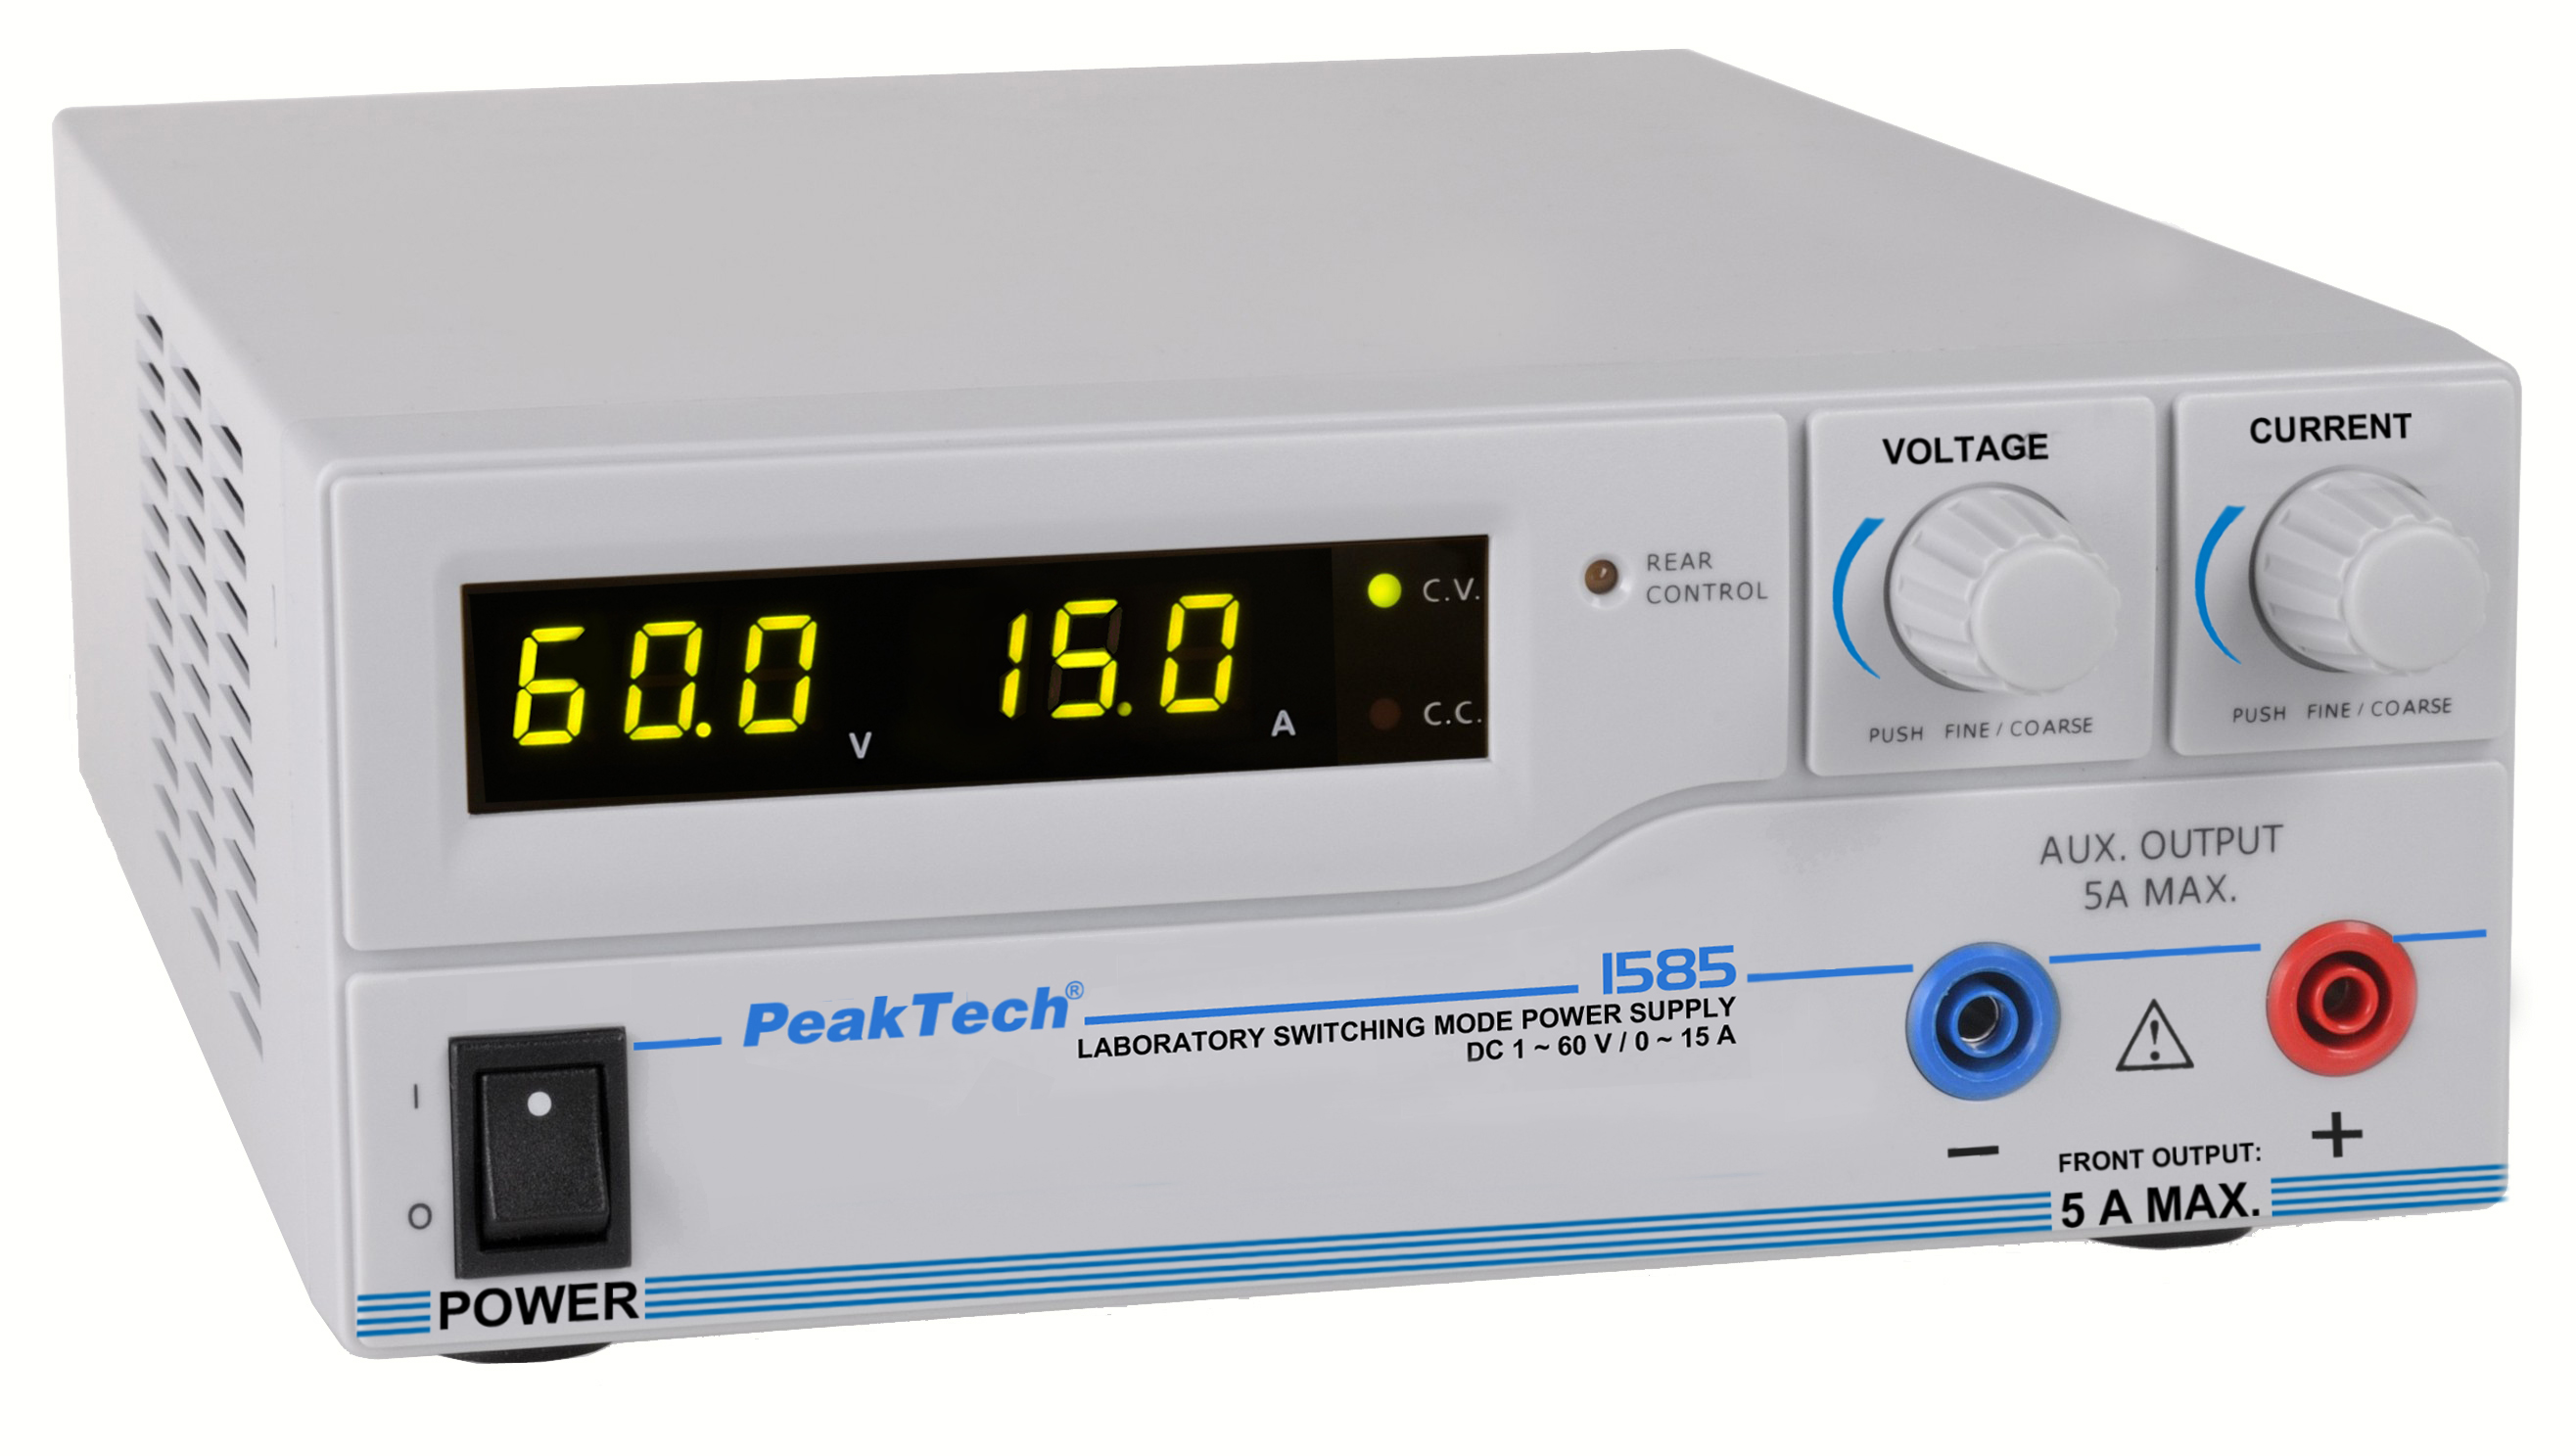 «PeakTech® P 1585» Laboratory power supply DC 1 - 60V / 0 - 15A & USB